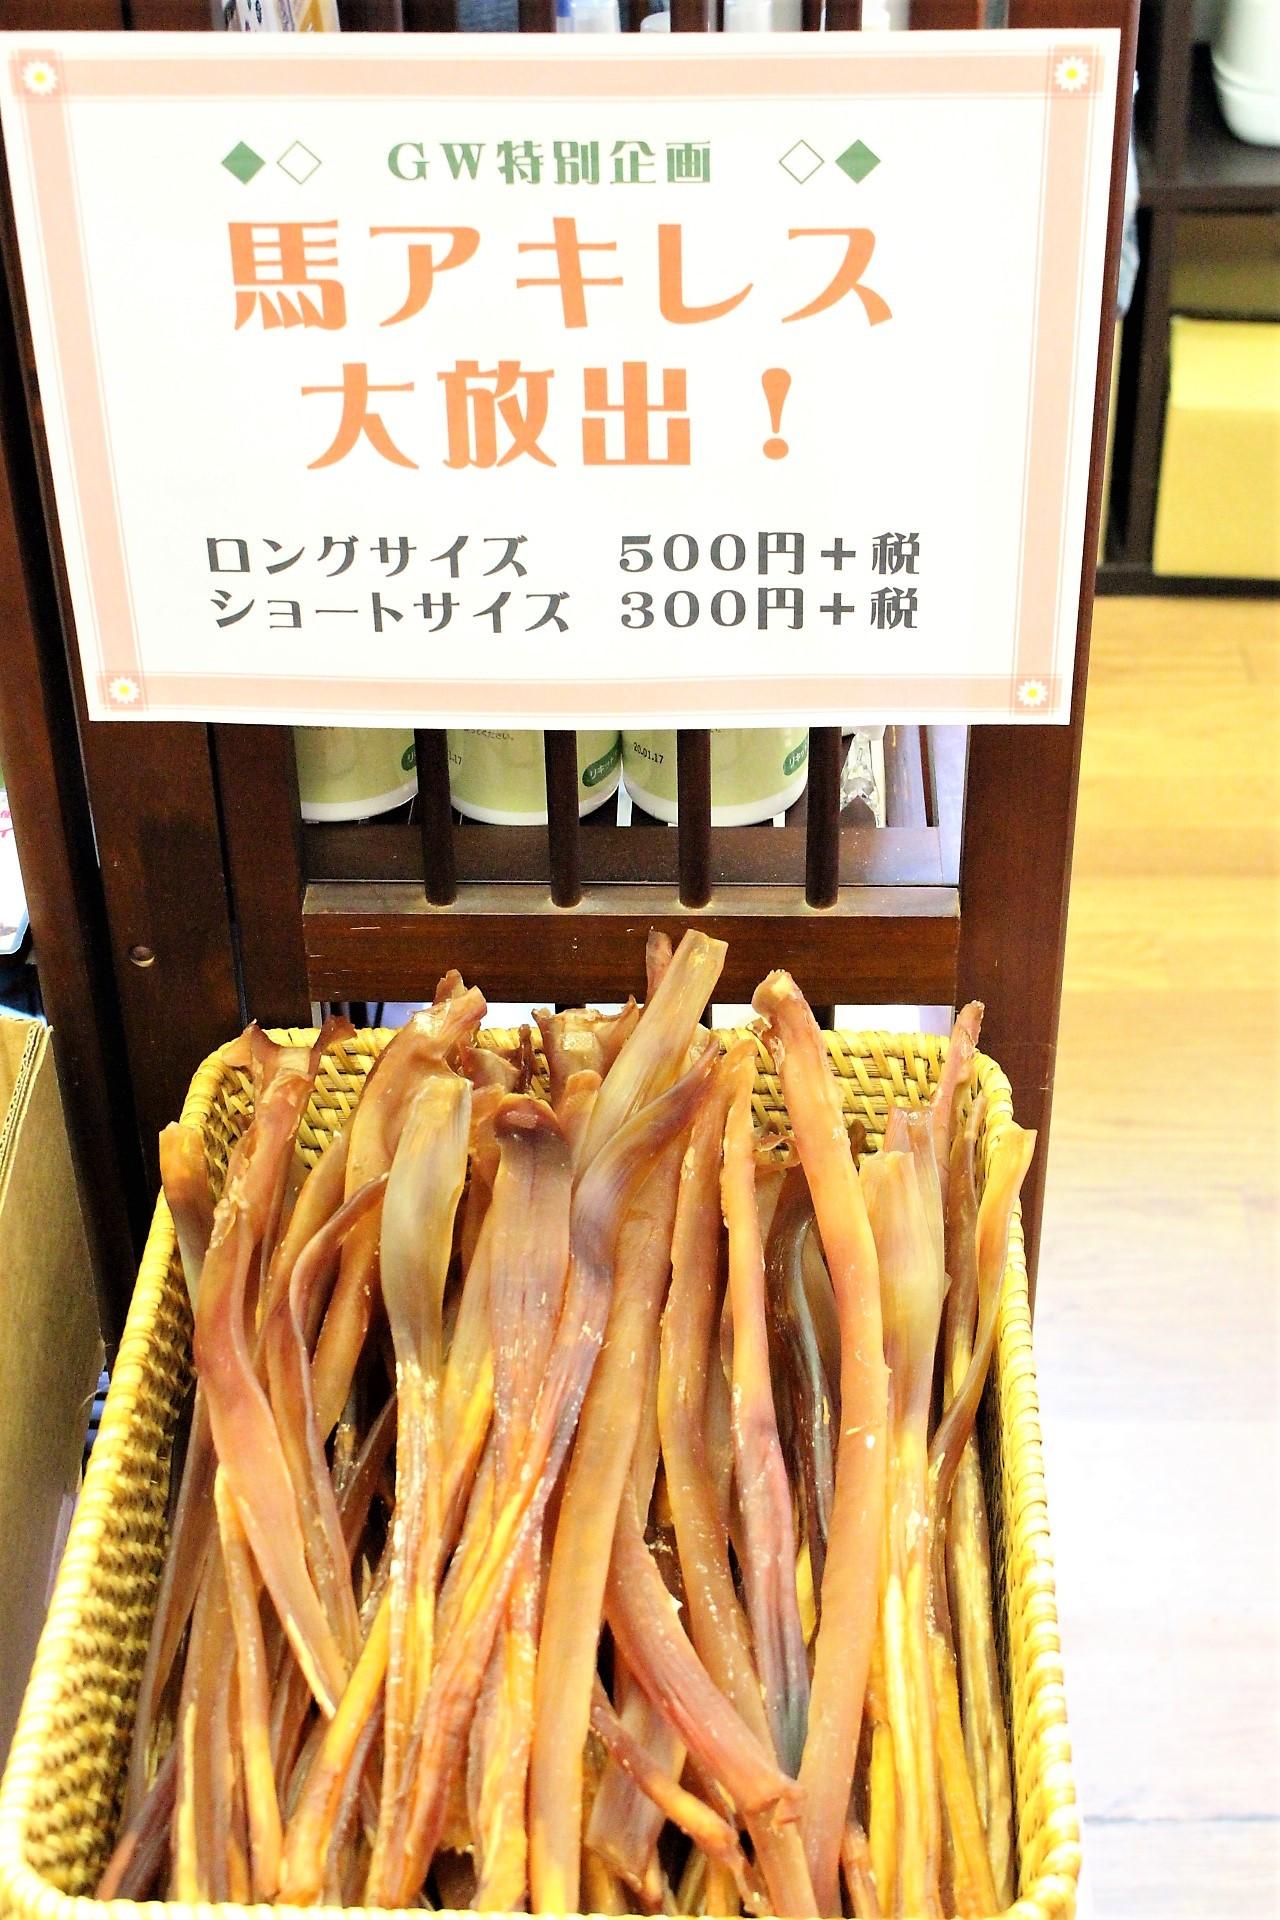 K's cafe ケーズカフェ>